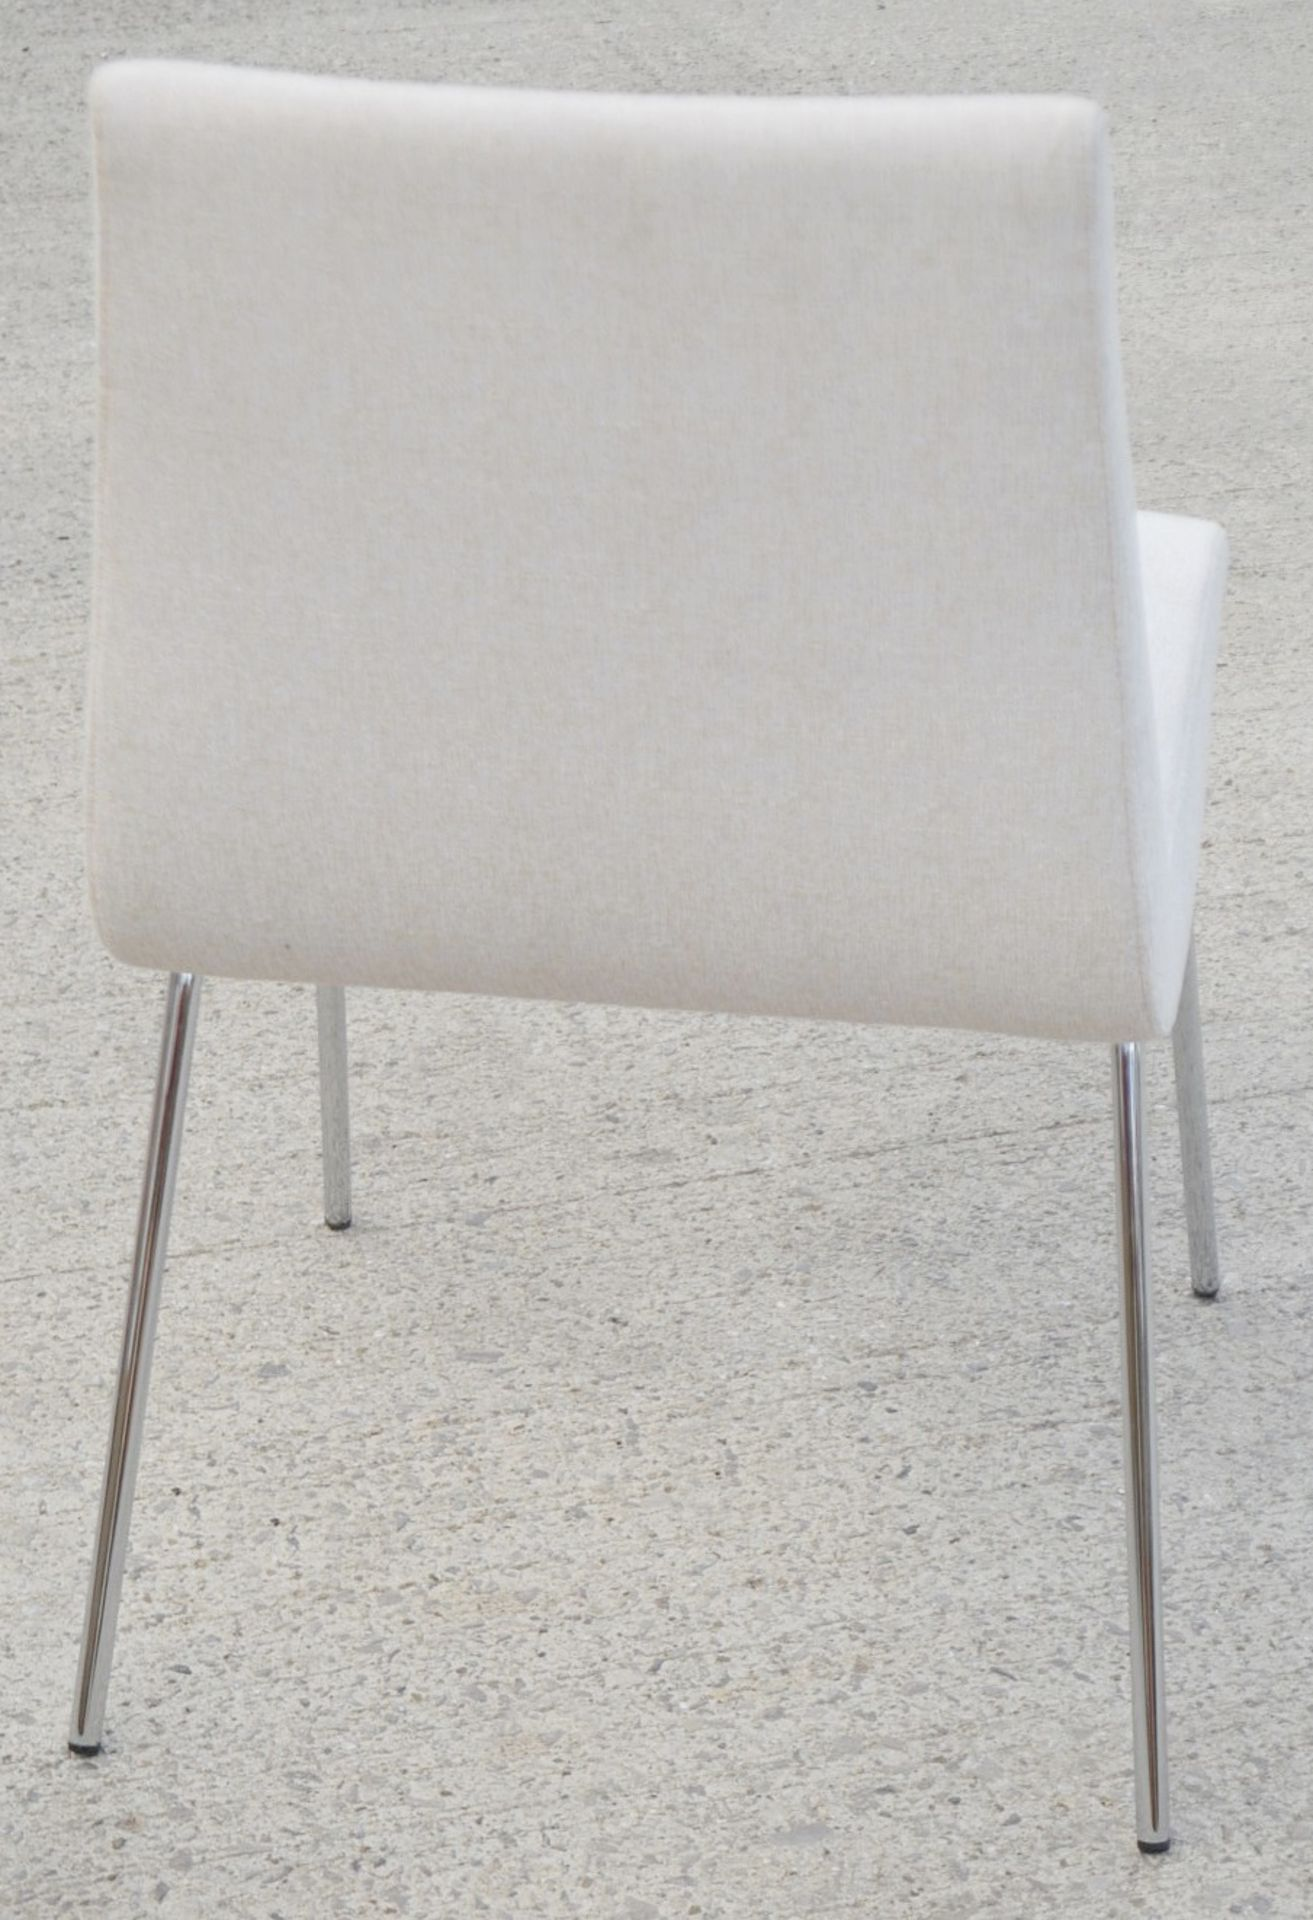 Pair Of LIGNE ROSET 'TV' Designer Dining Chairs In A Light Neutral Beige Fabric & Chromed Steel Legs - Image 3 of 9